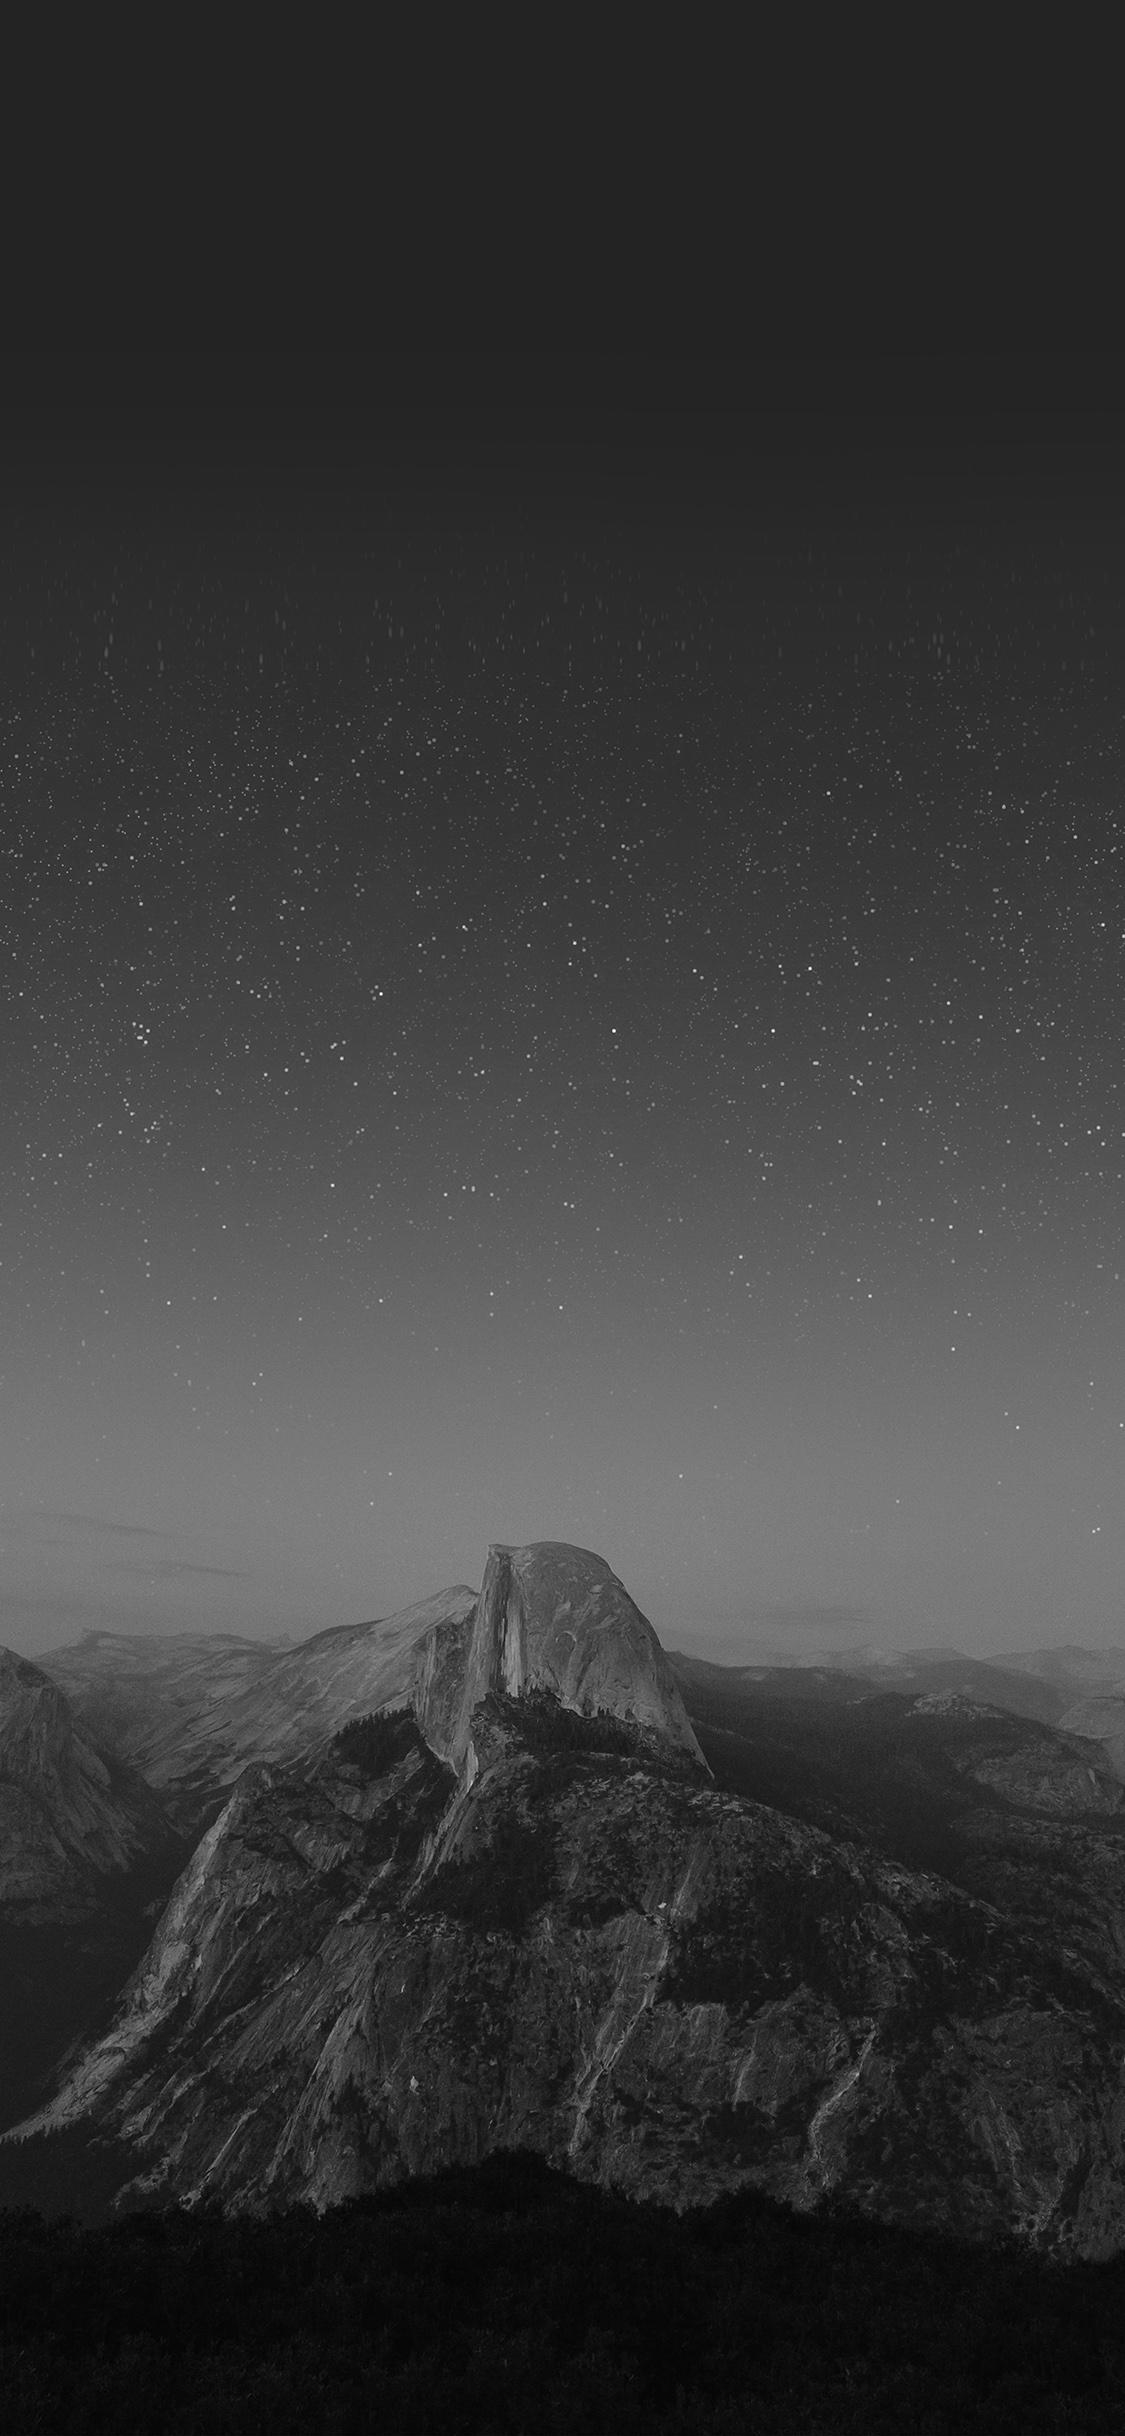 iPhonexpapers.com-Apple-iPhone-wallpaper-mw12-el-capitan-mountain-wood-night-sky-star-dark-bw